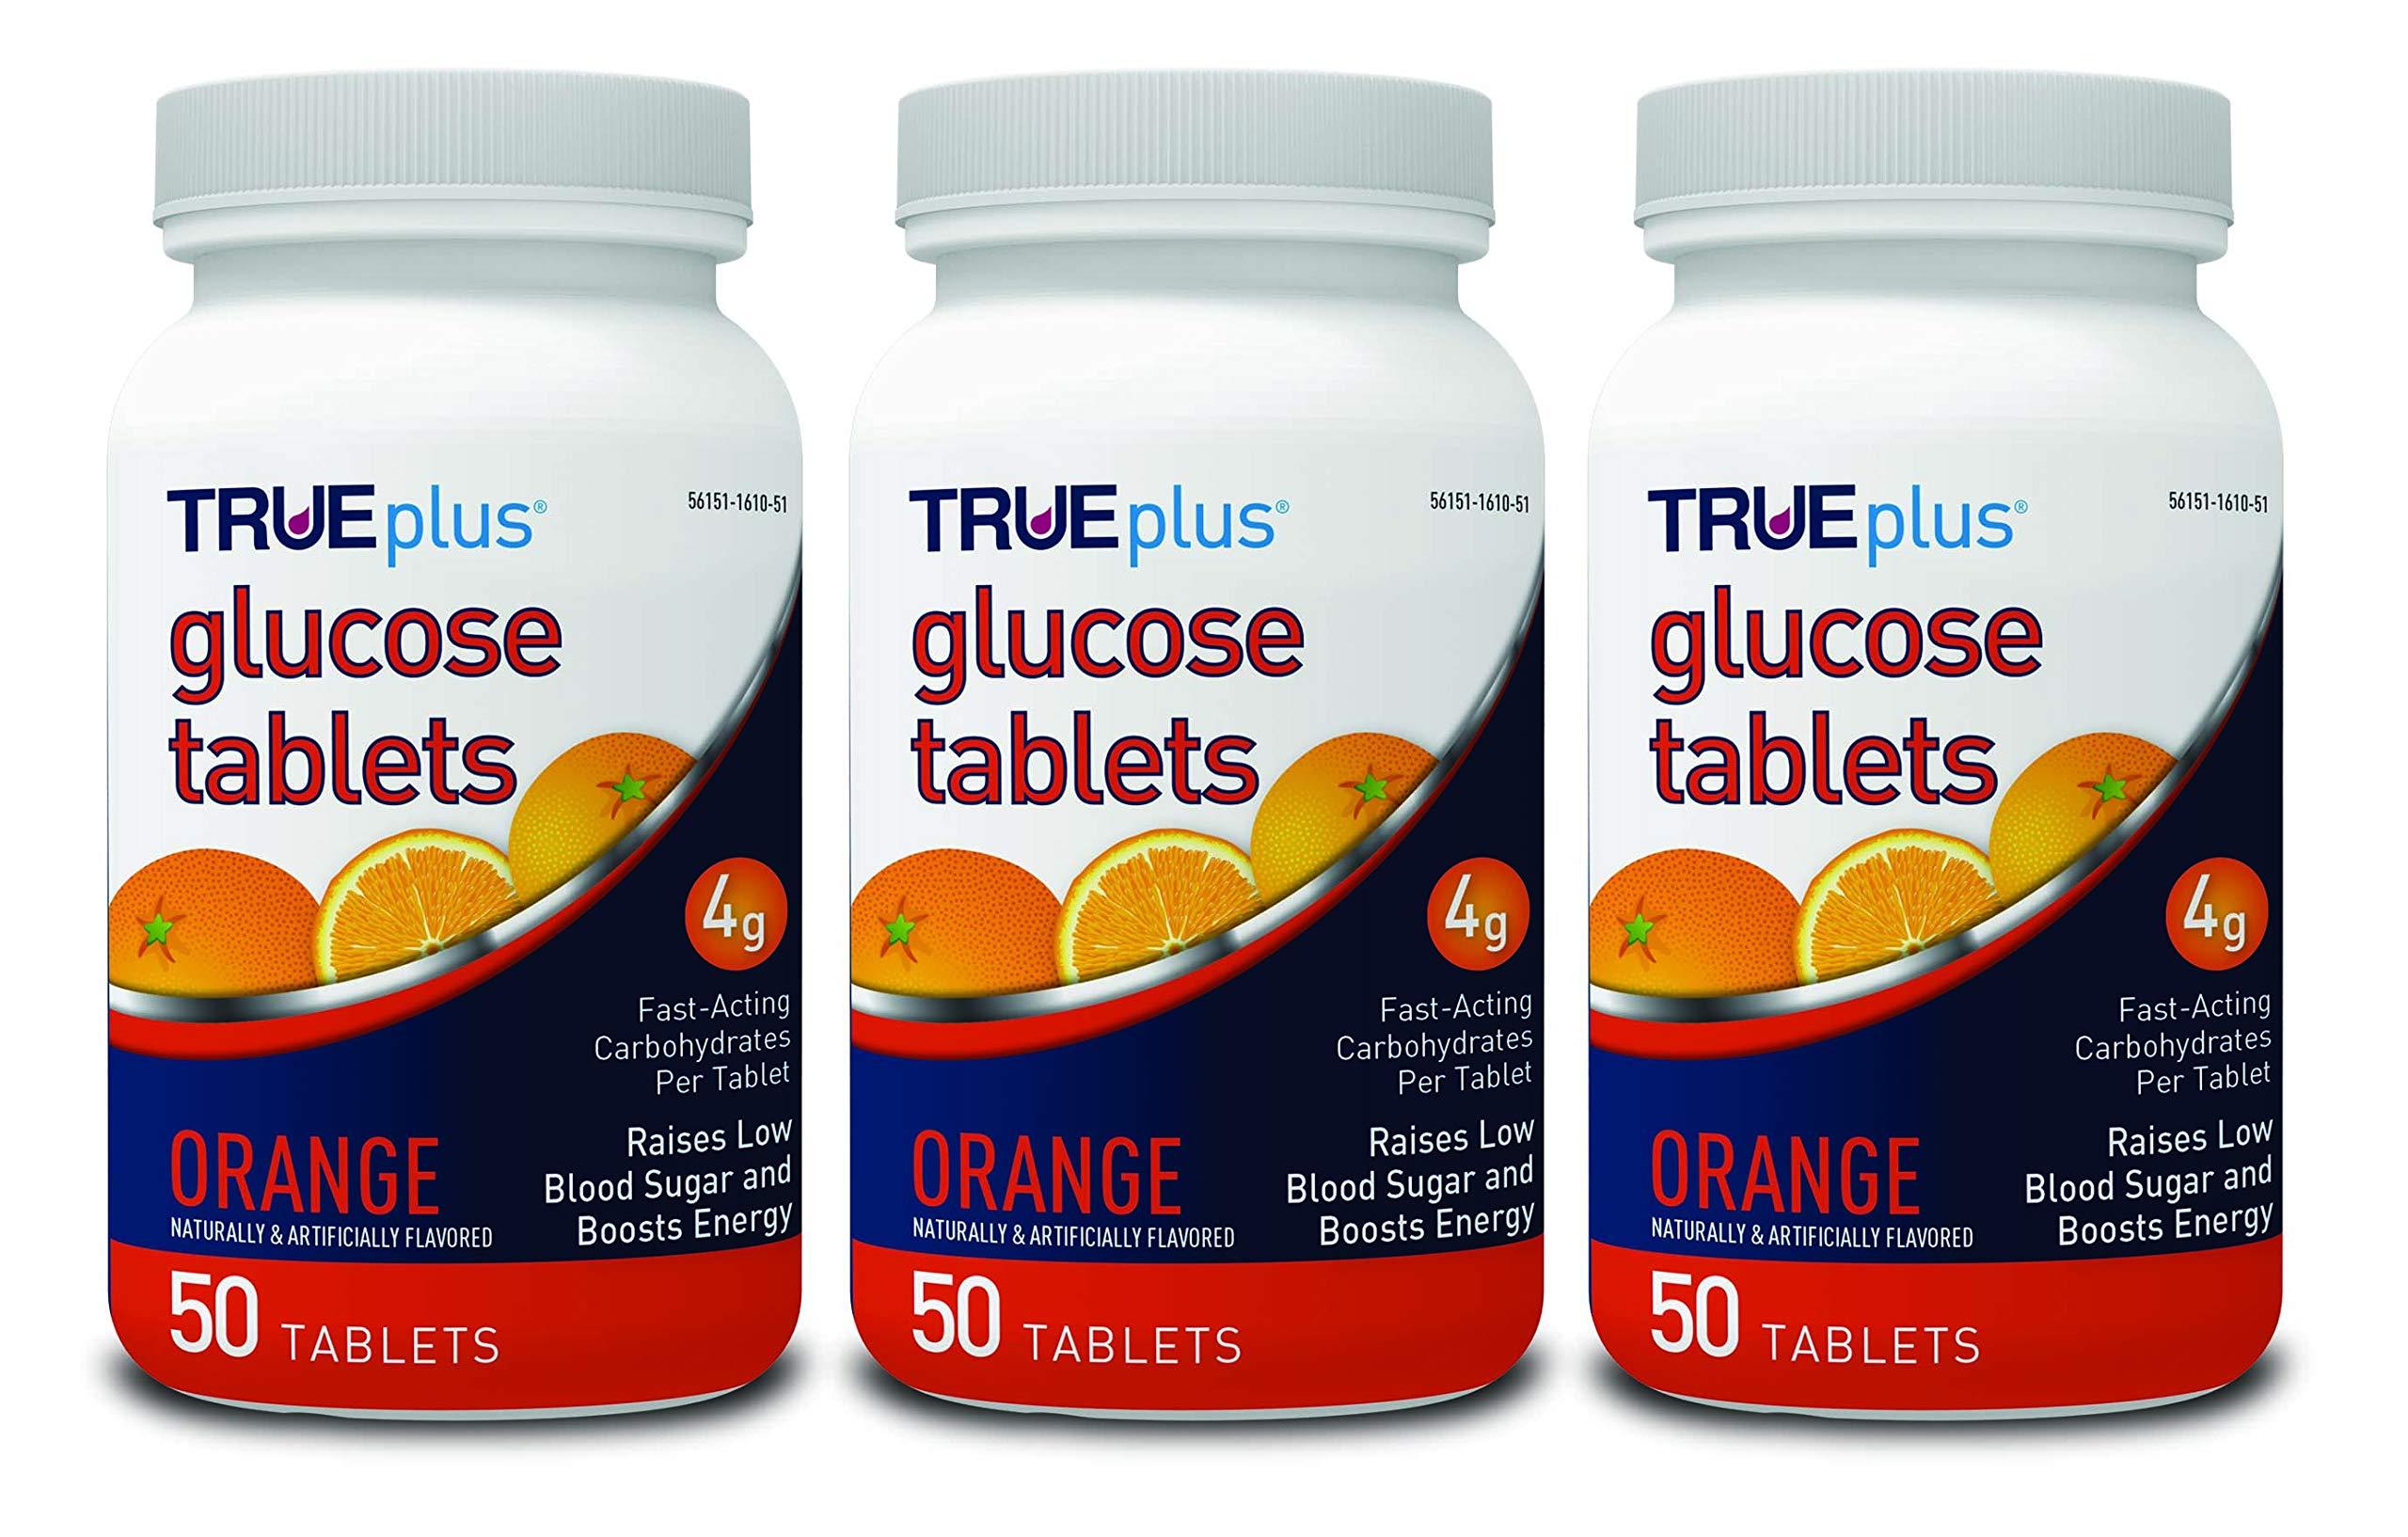 TRUEplus® Glucose Tablets, Orange Flavor - 50ct Bottle - 3 Pack by TRUEplus